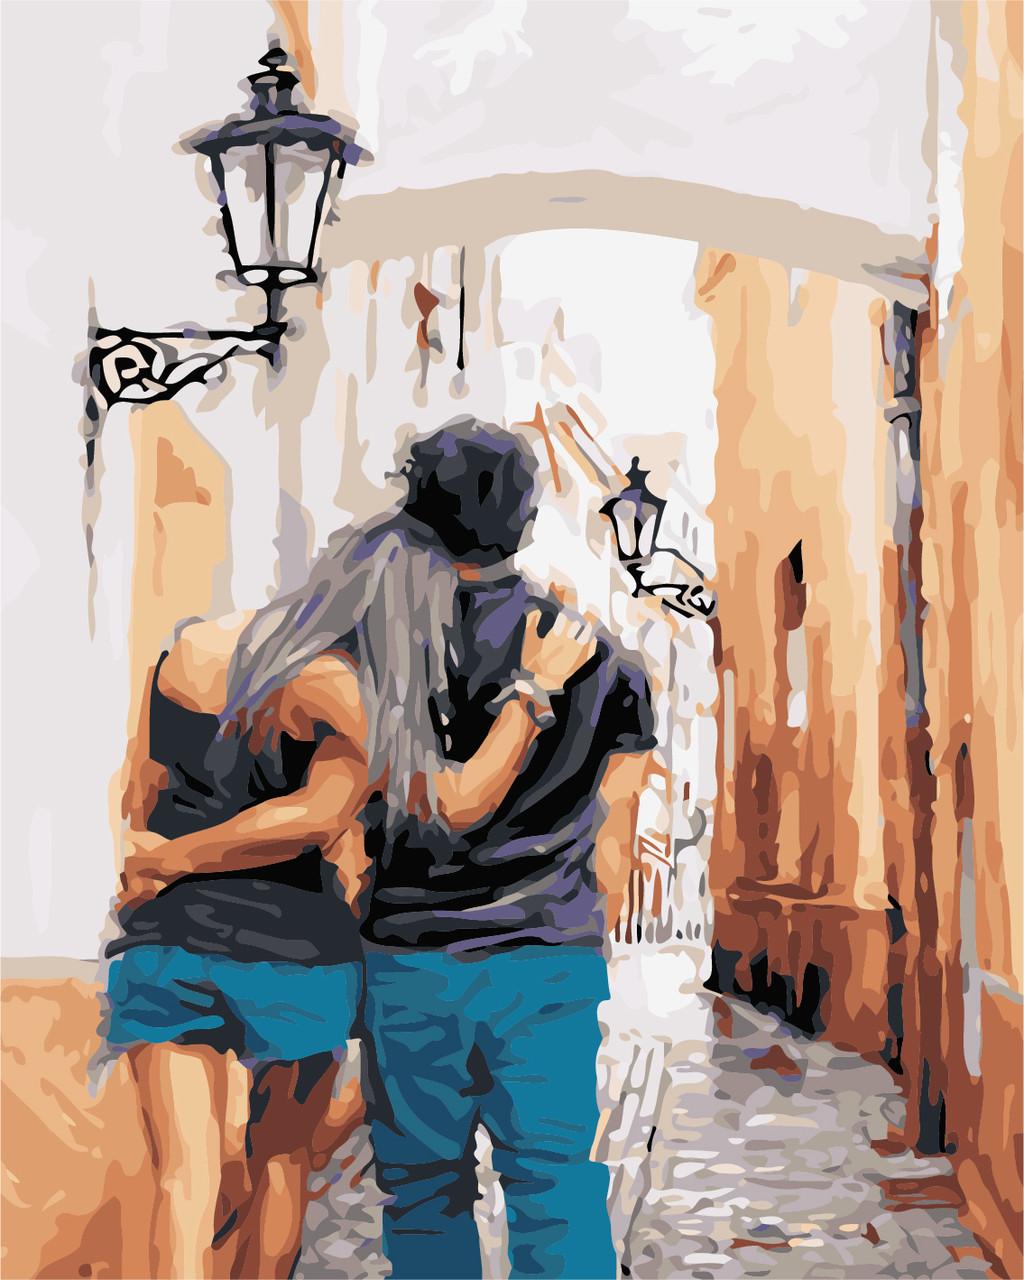 Художественный творческий набор, картина по номерам Прогулка (Richard Macneil), 40x50 см, «Art Story» (AS0429)